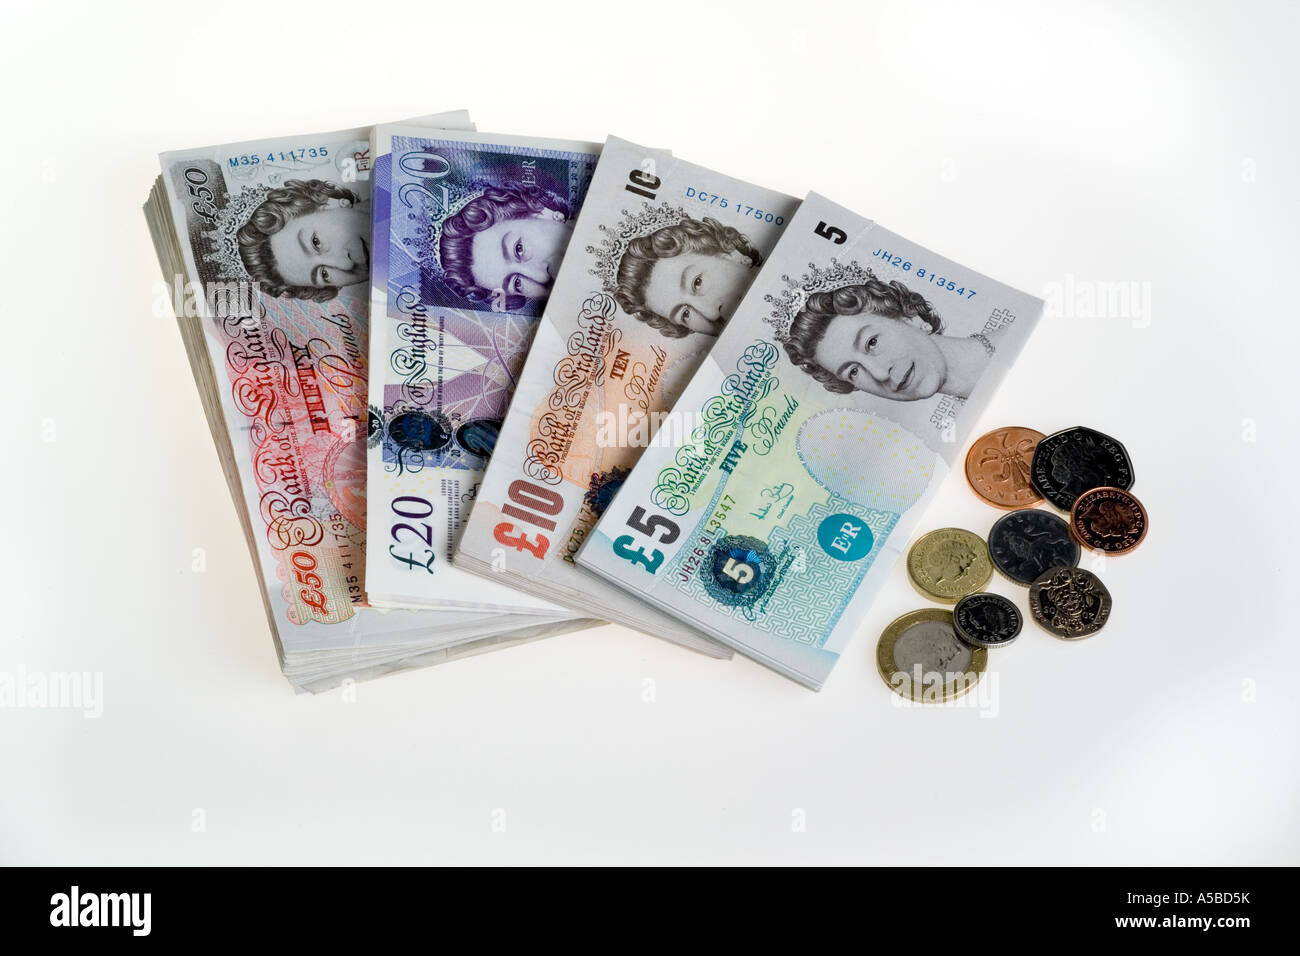 Hoekbank Twenty 5.All British Bank Notes 5 10 20 50 And Uk Coins Stock